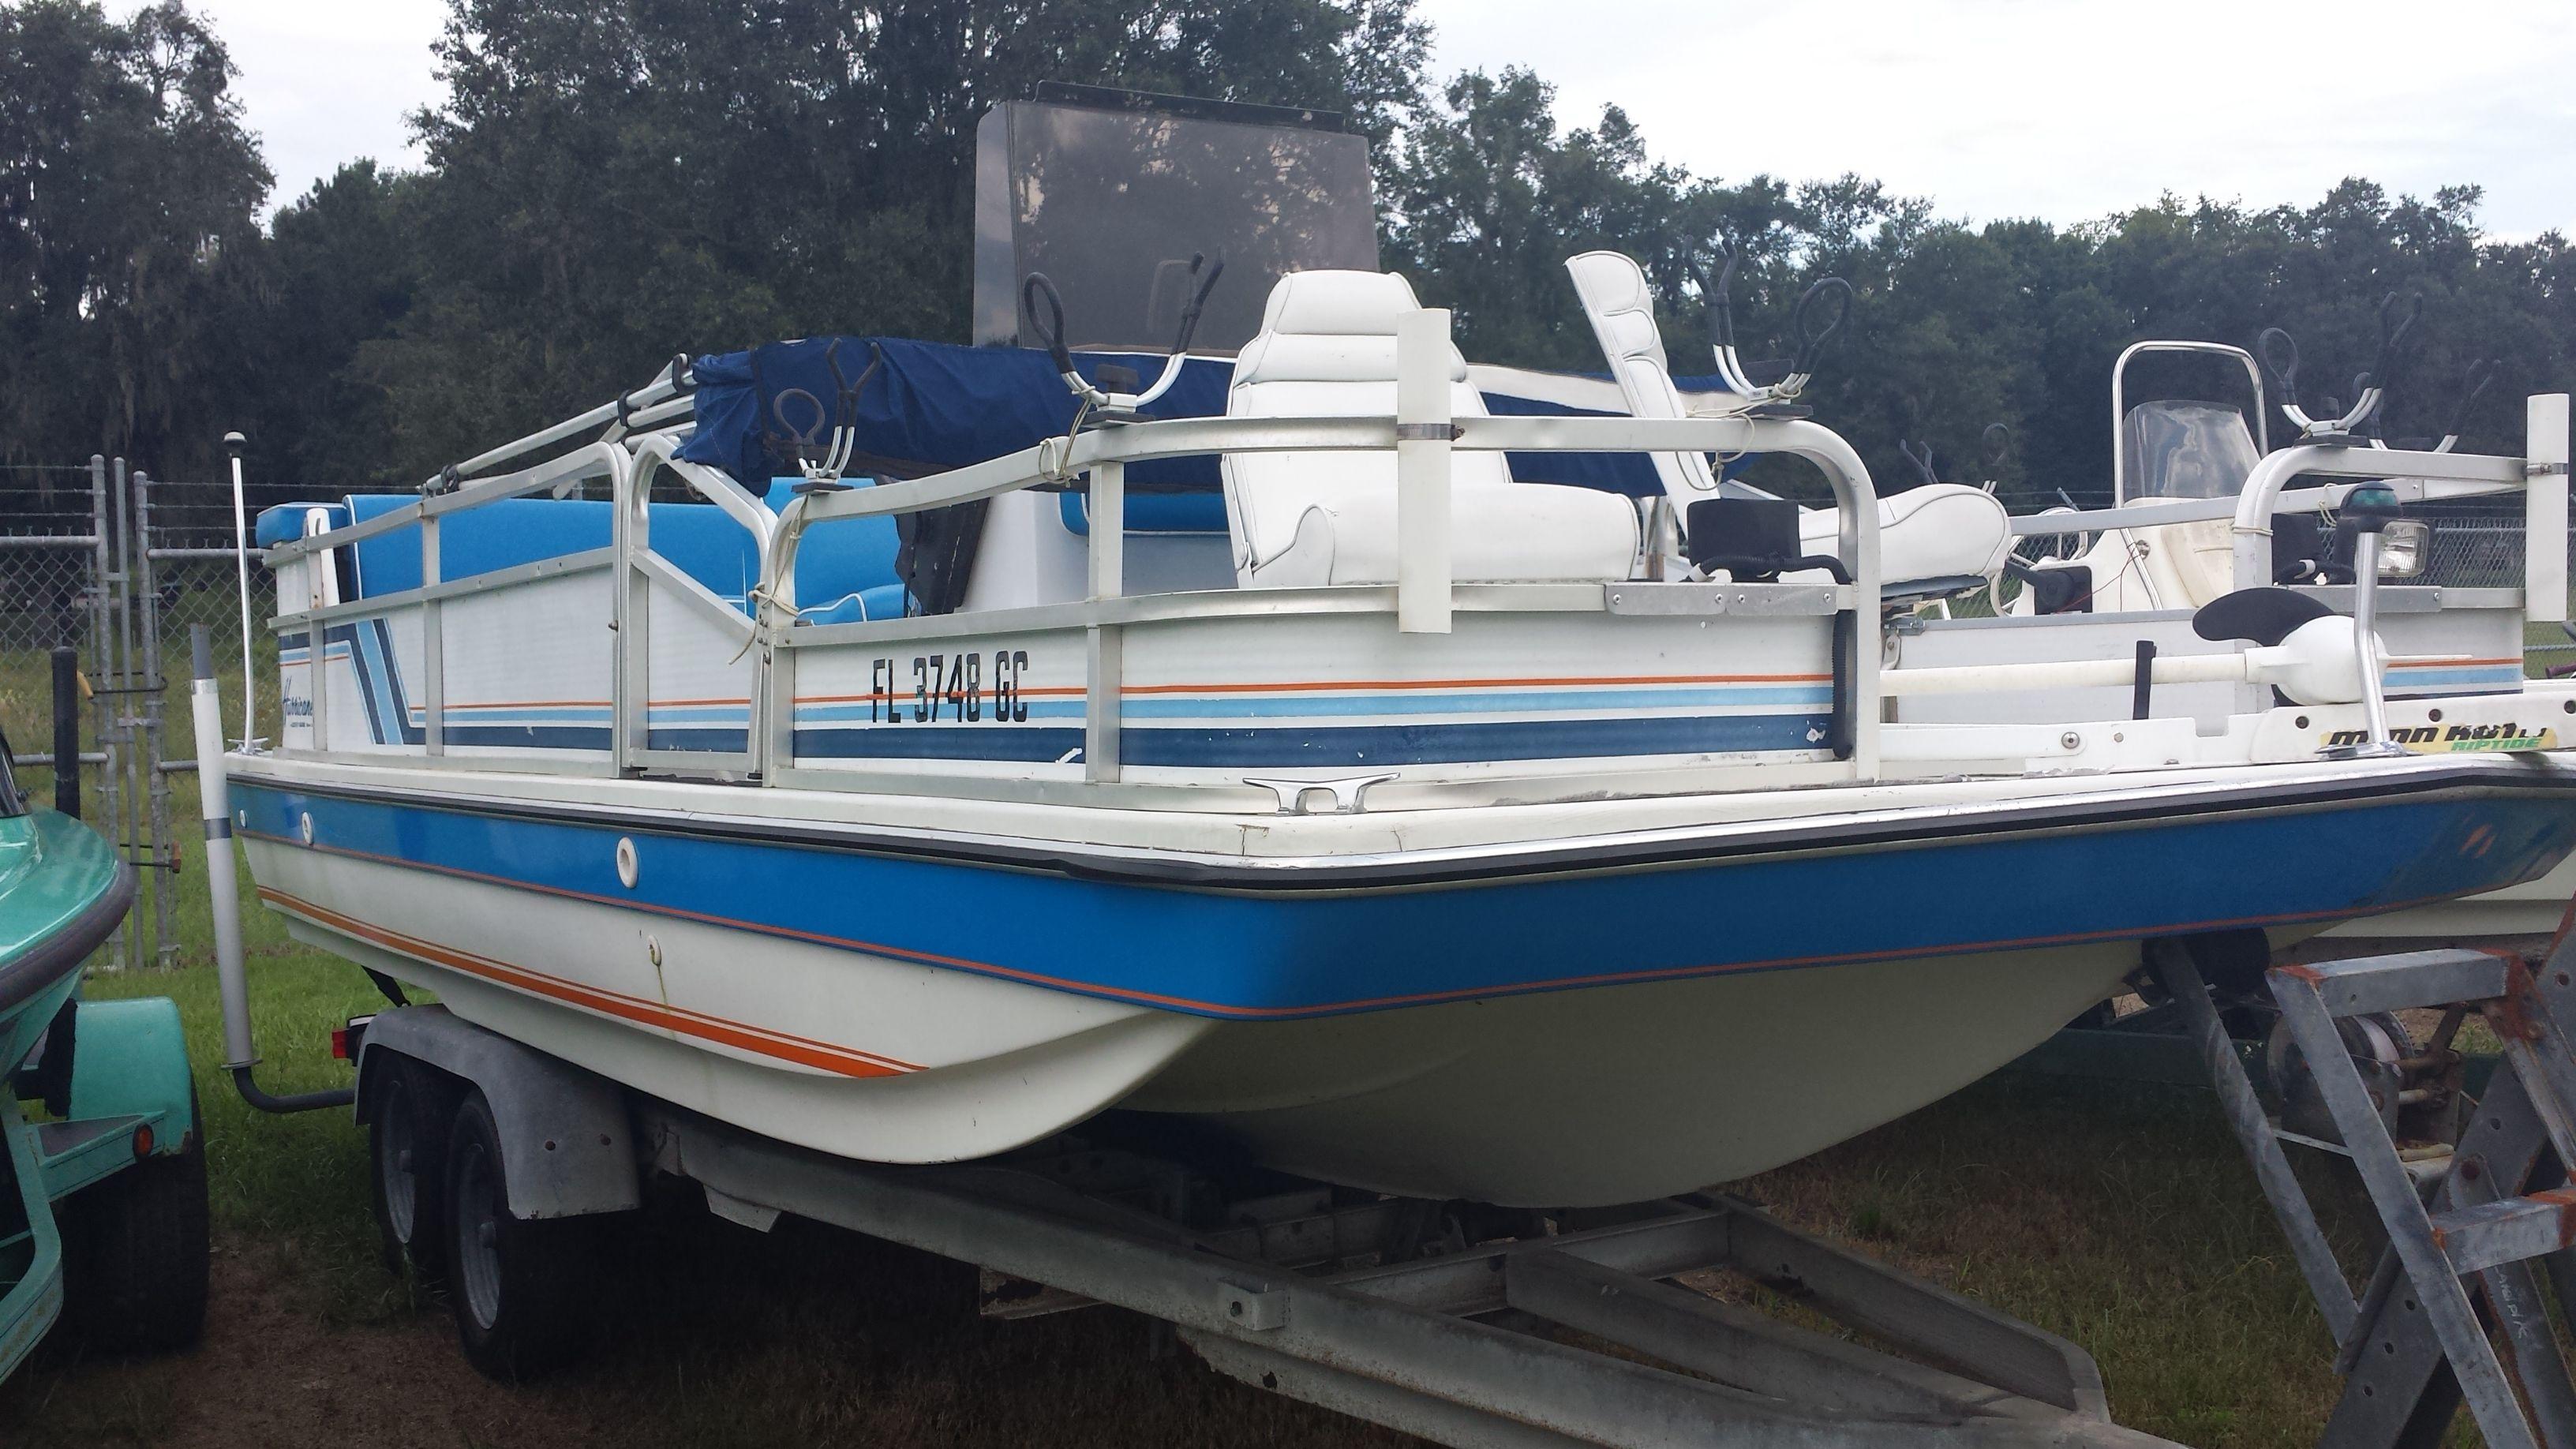 1990 Hurricane Deck Boat 2 995 Call Polaris Of Gainesville At 386 418 4244 Hurricane Deck Boat Deck Boat Boat